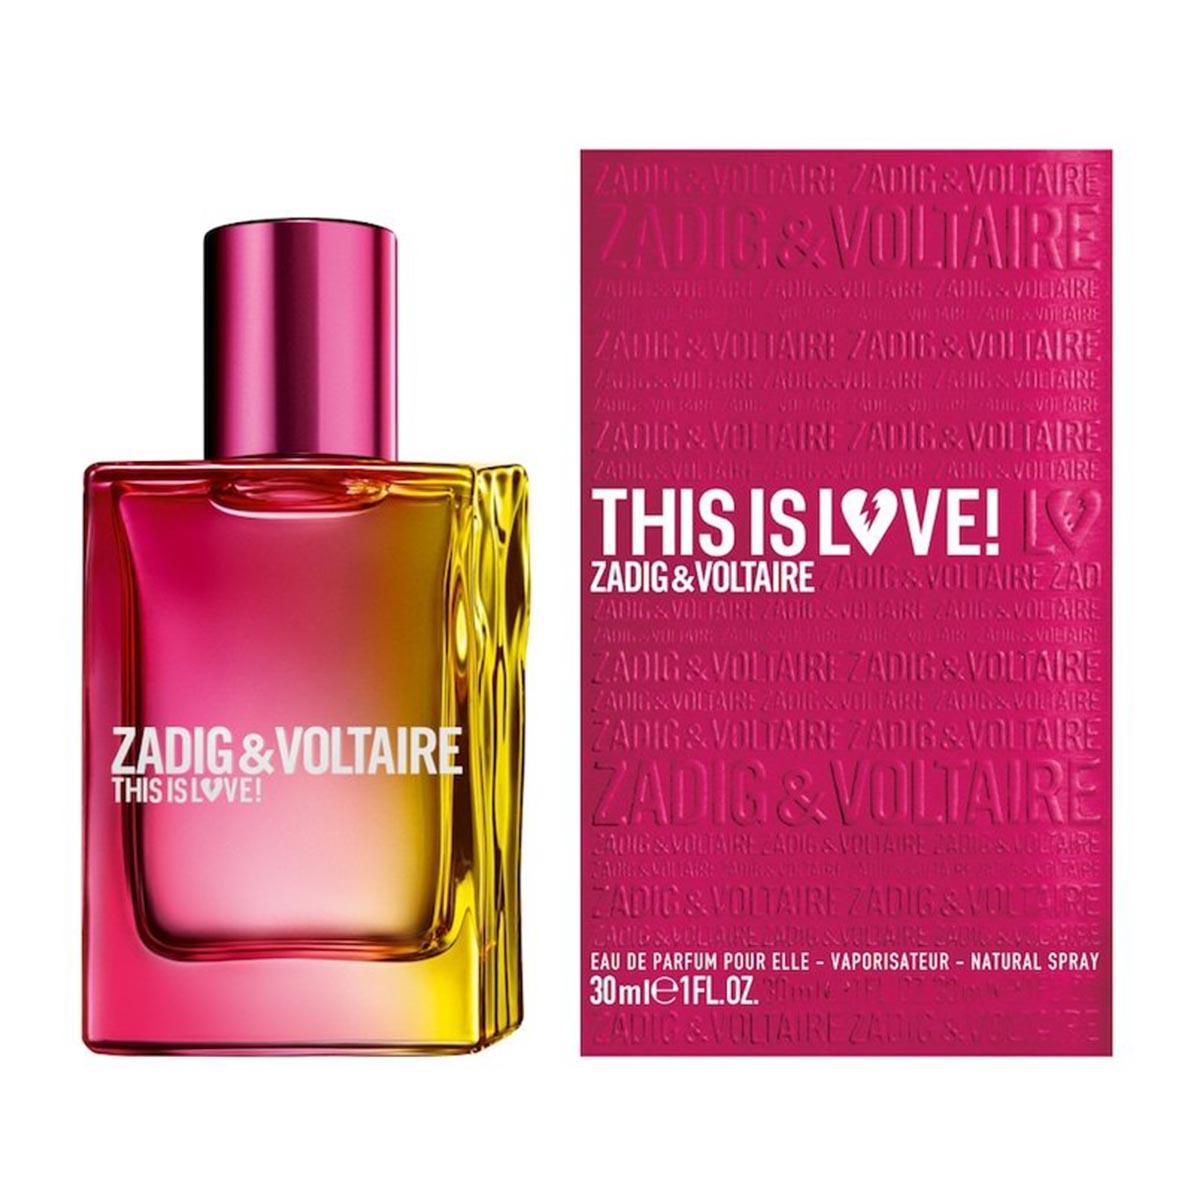 Zadig voltaire this is love elle edp 30vp - BellezaMagica.com